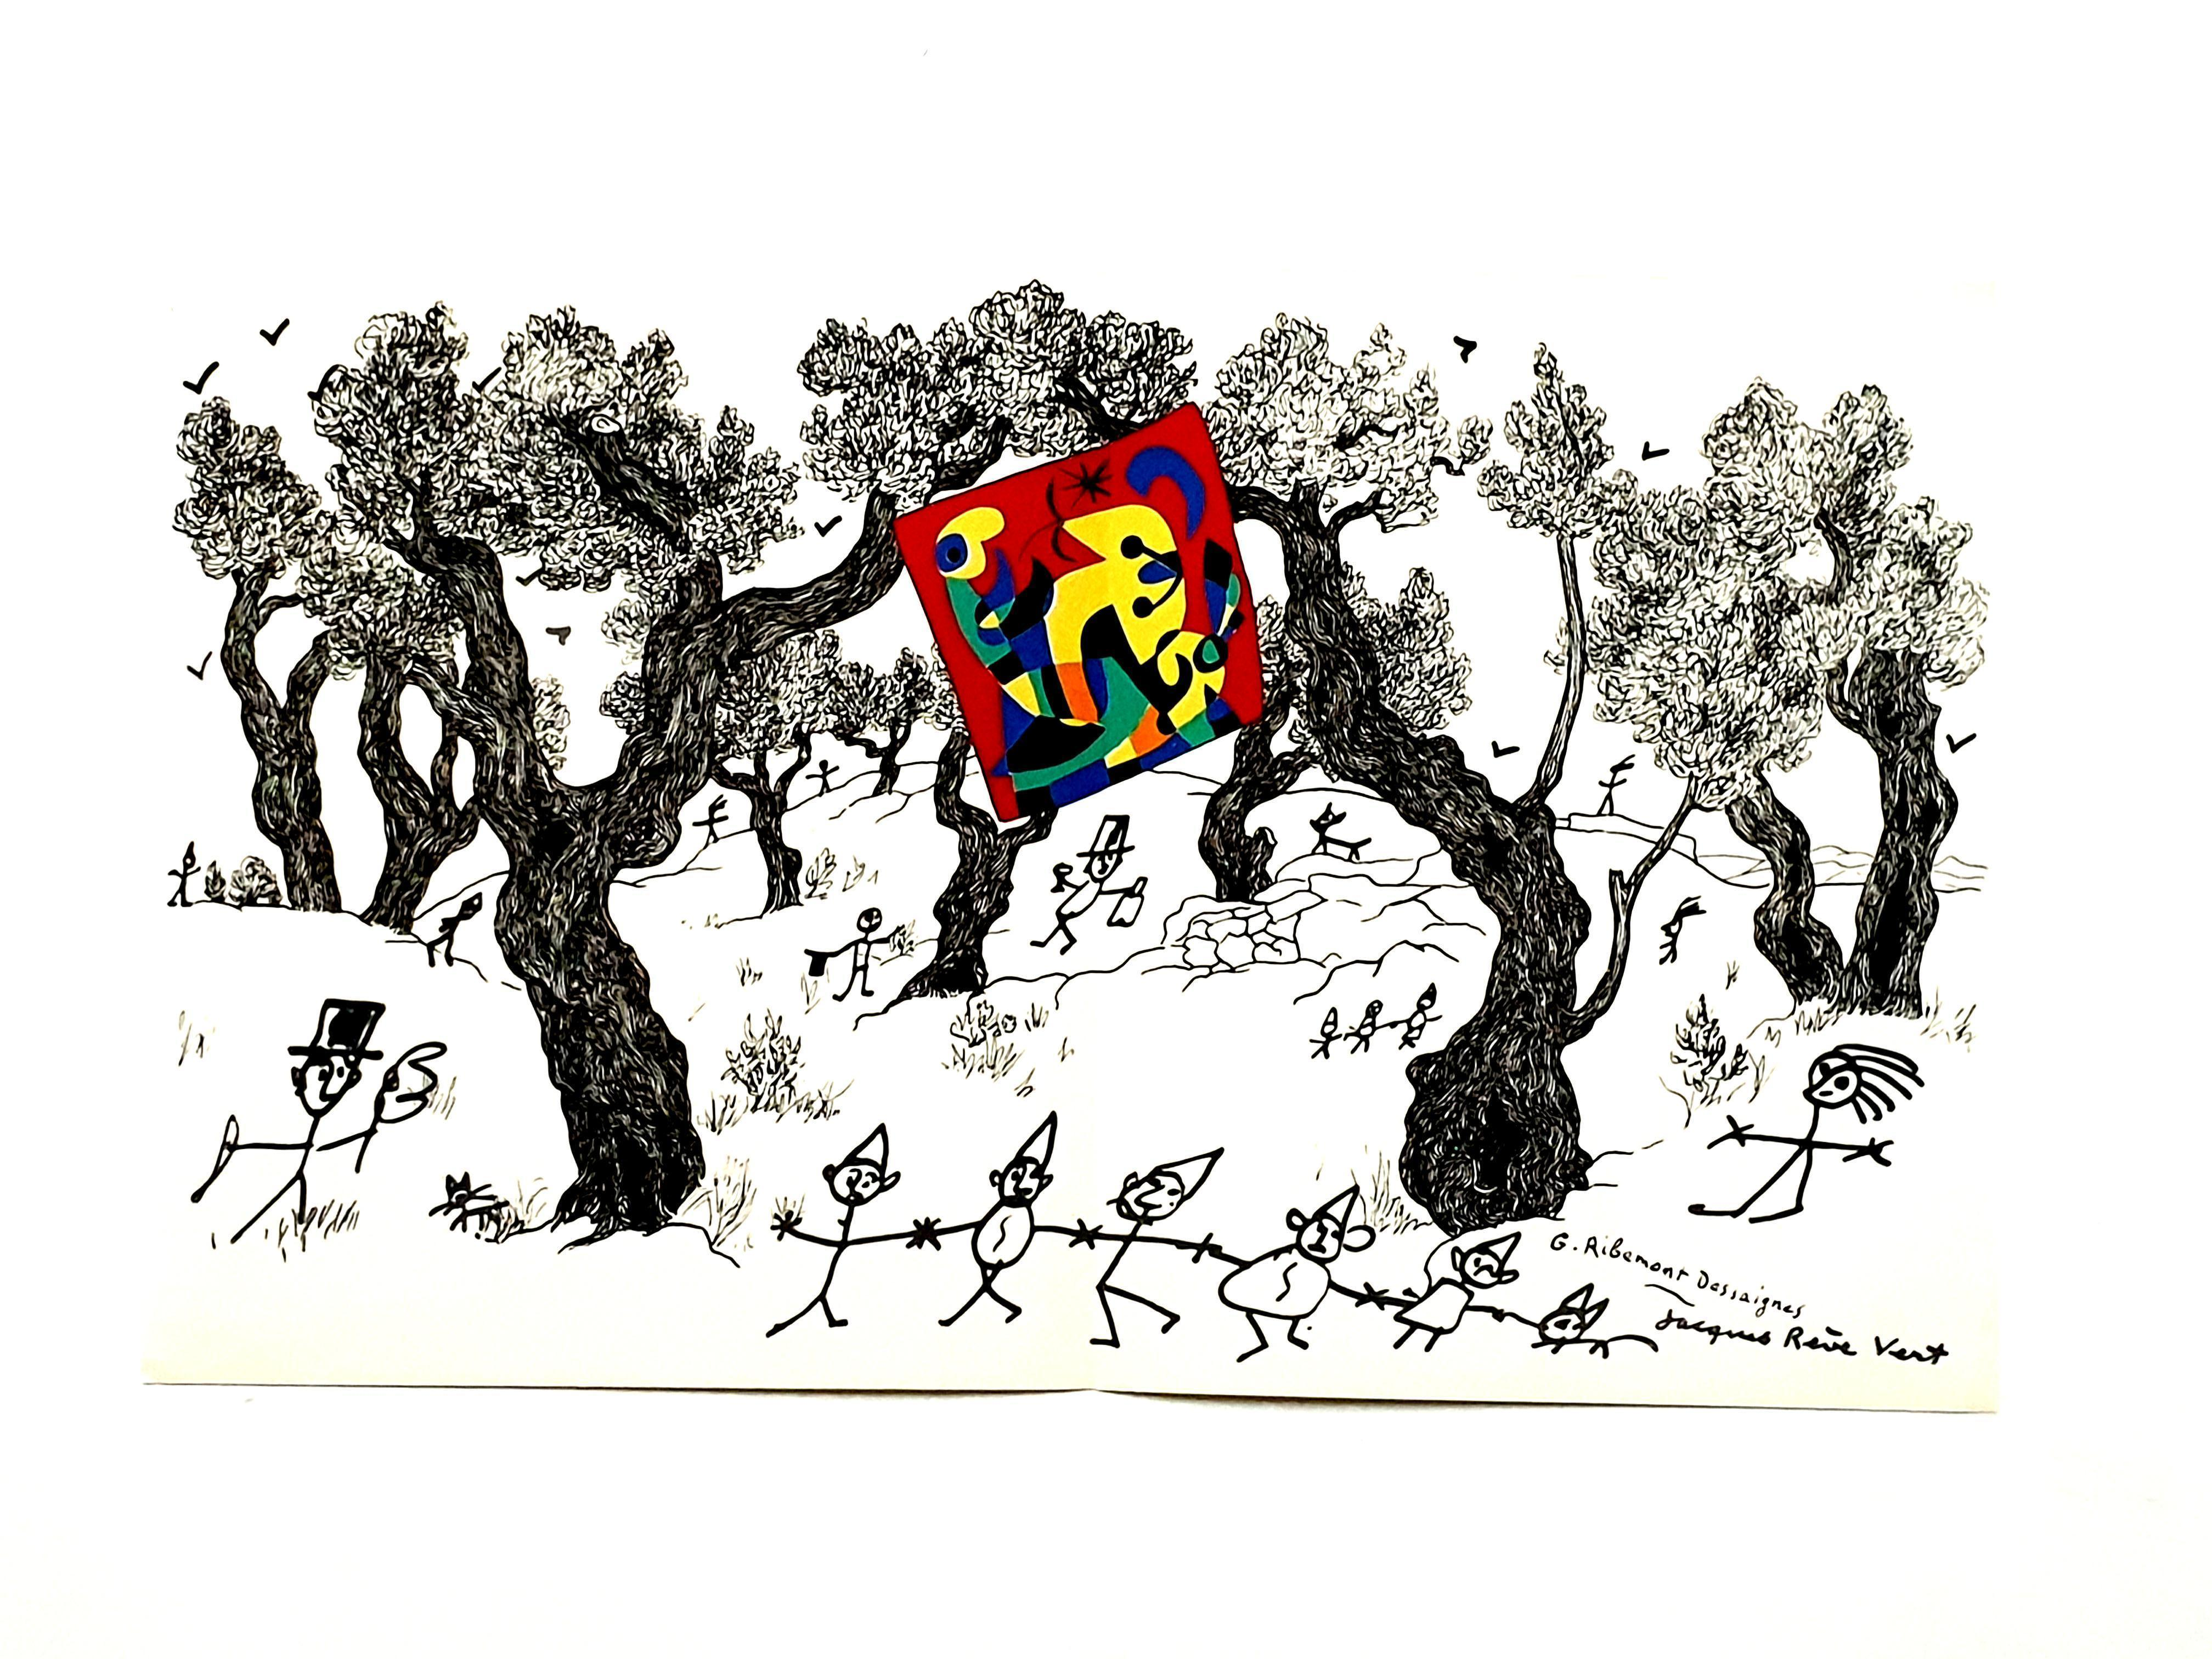 Joan Miro - The Party - Original Lithograph